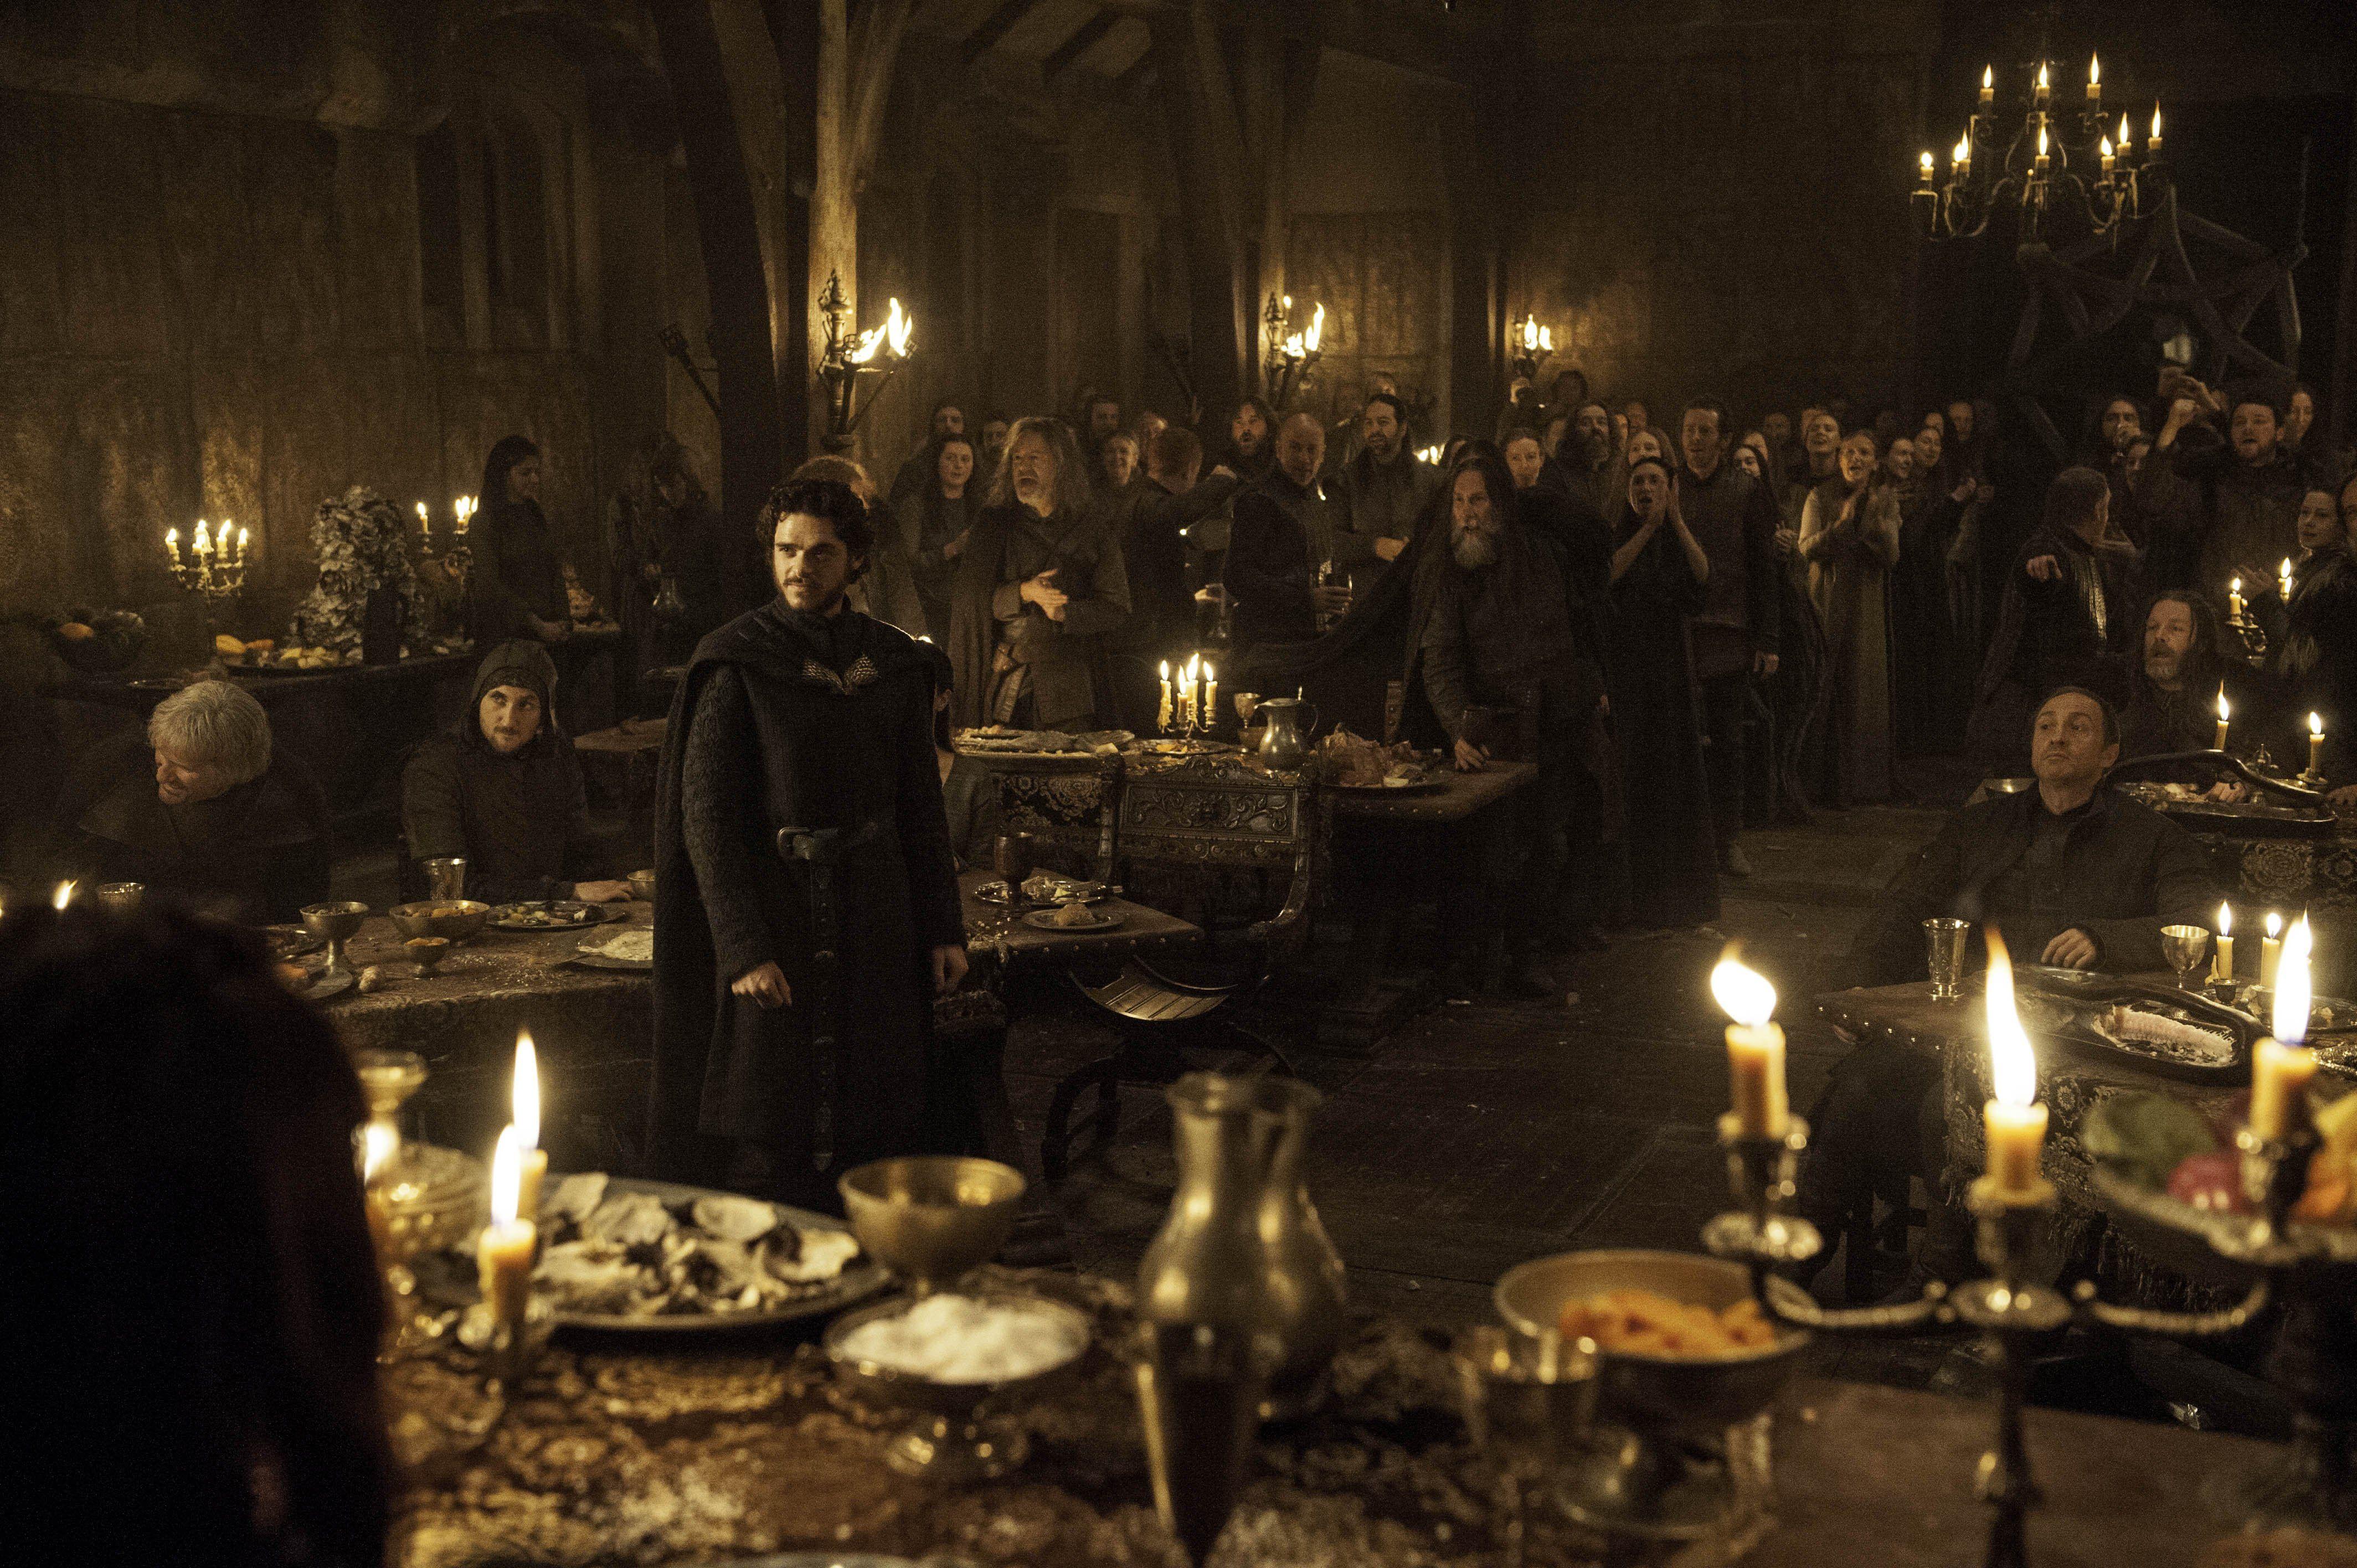 Game Of Thrones Photo Robb Stark Wedding Games Red Wedding Wedding Party Supplies